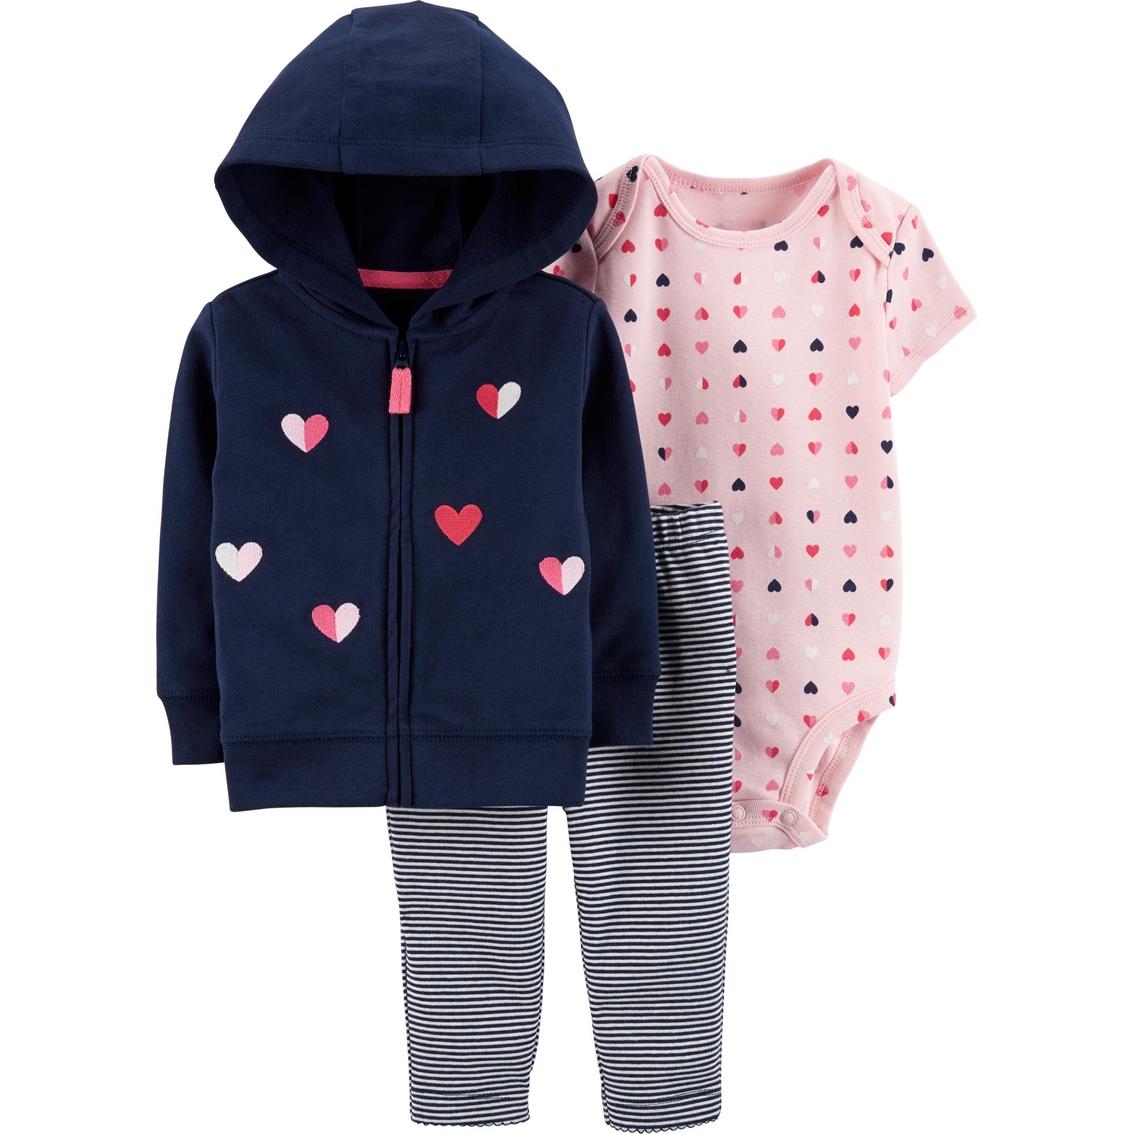 74dad5ed5e6b Carter s Infant Girls 3 Pc. Hearts Cardigan Set